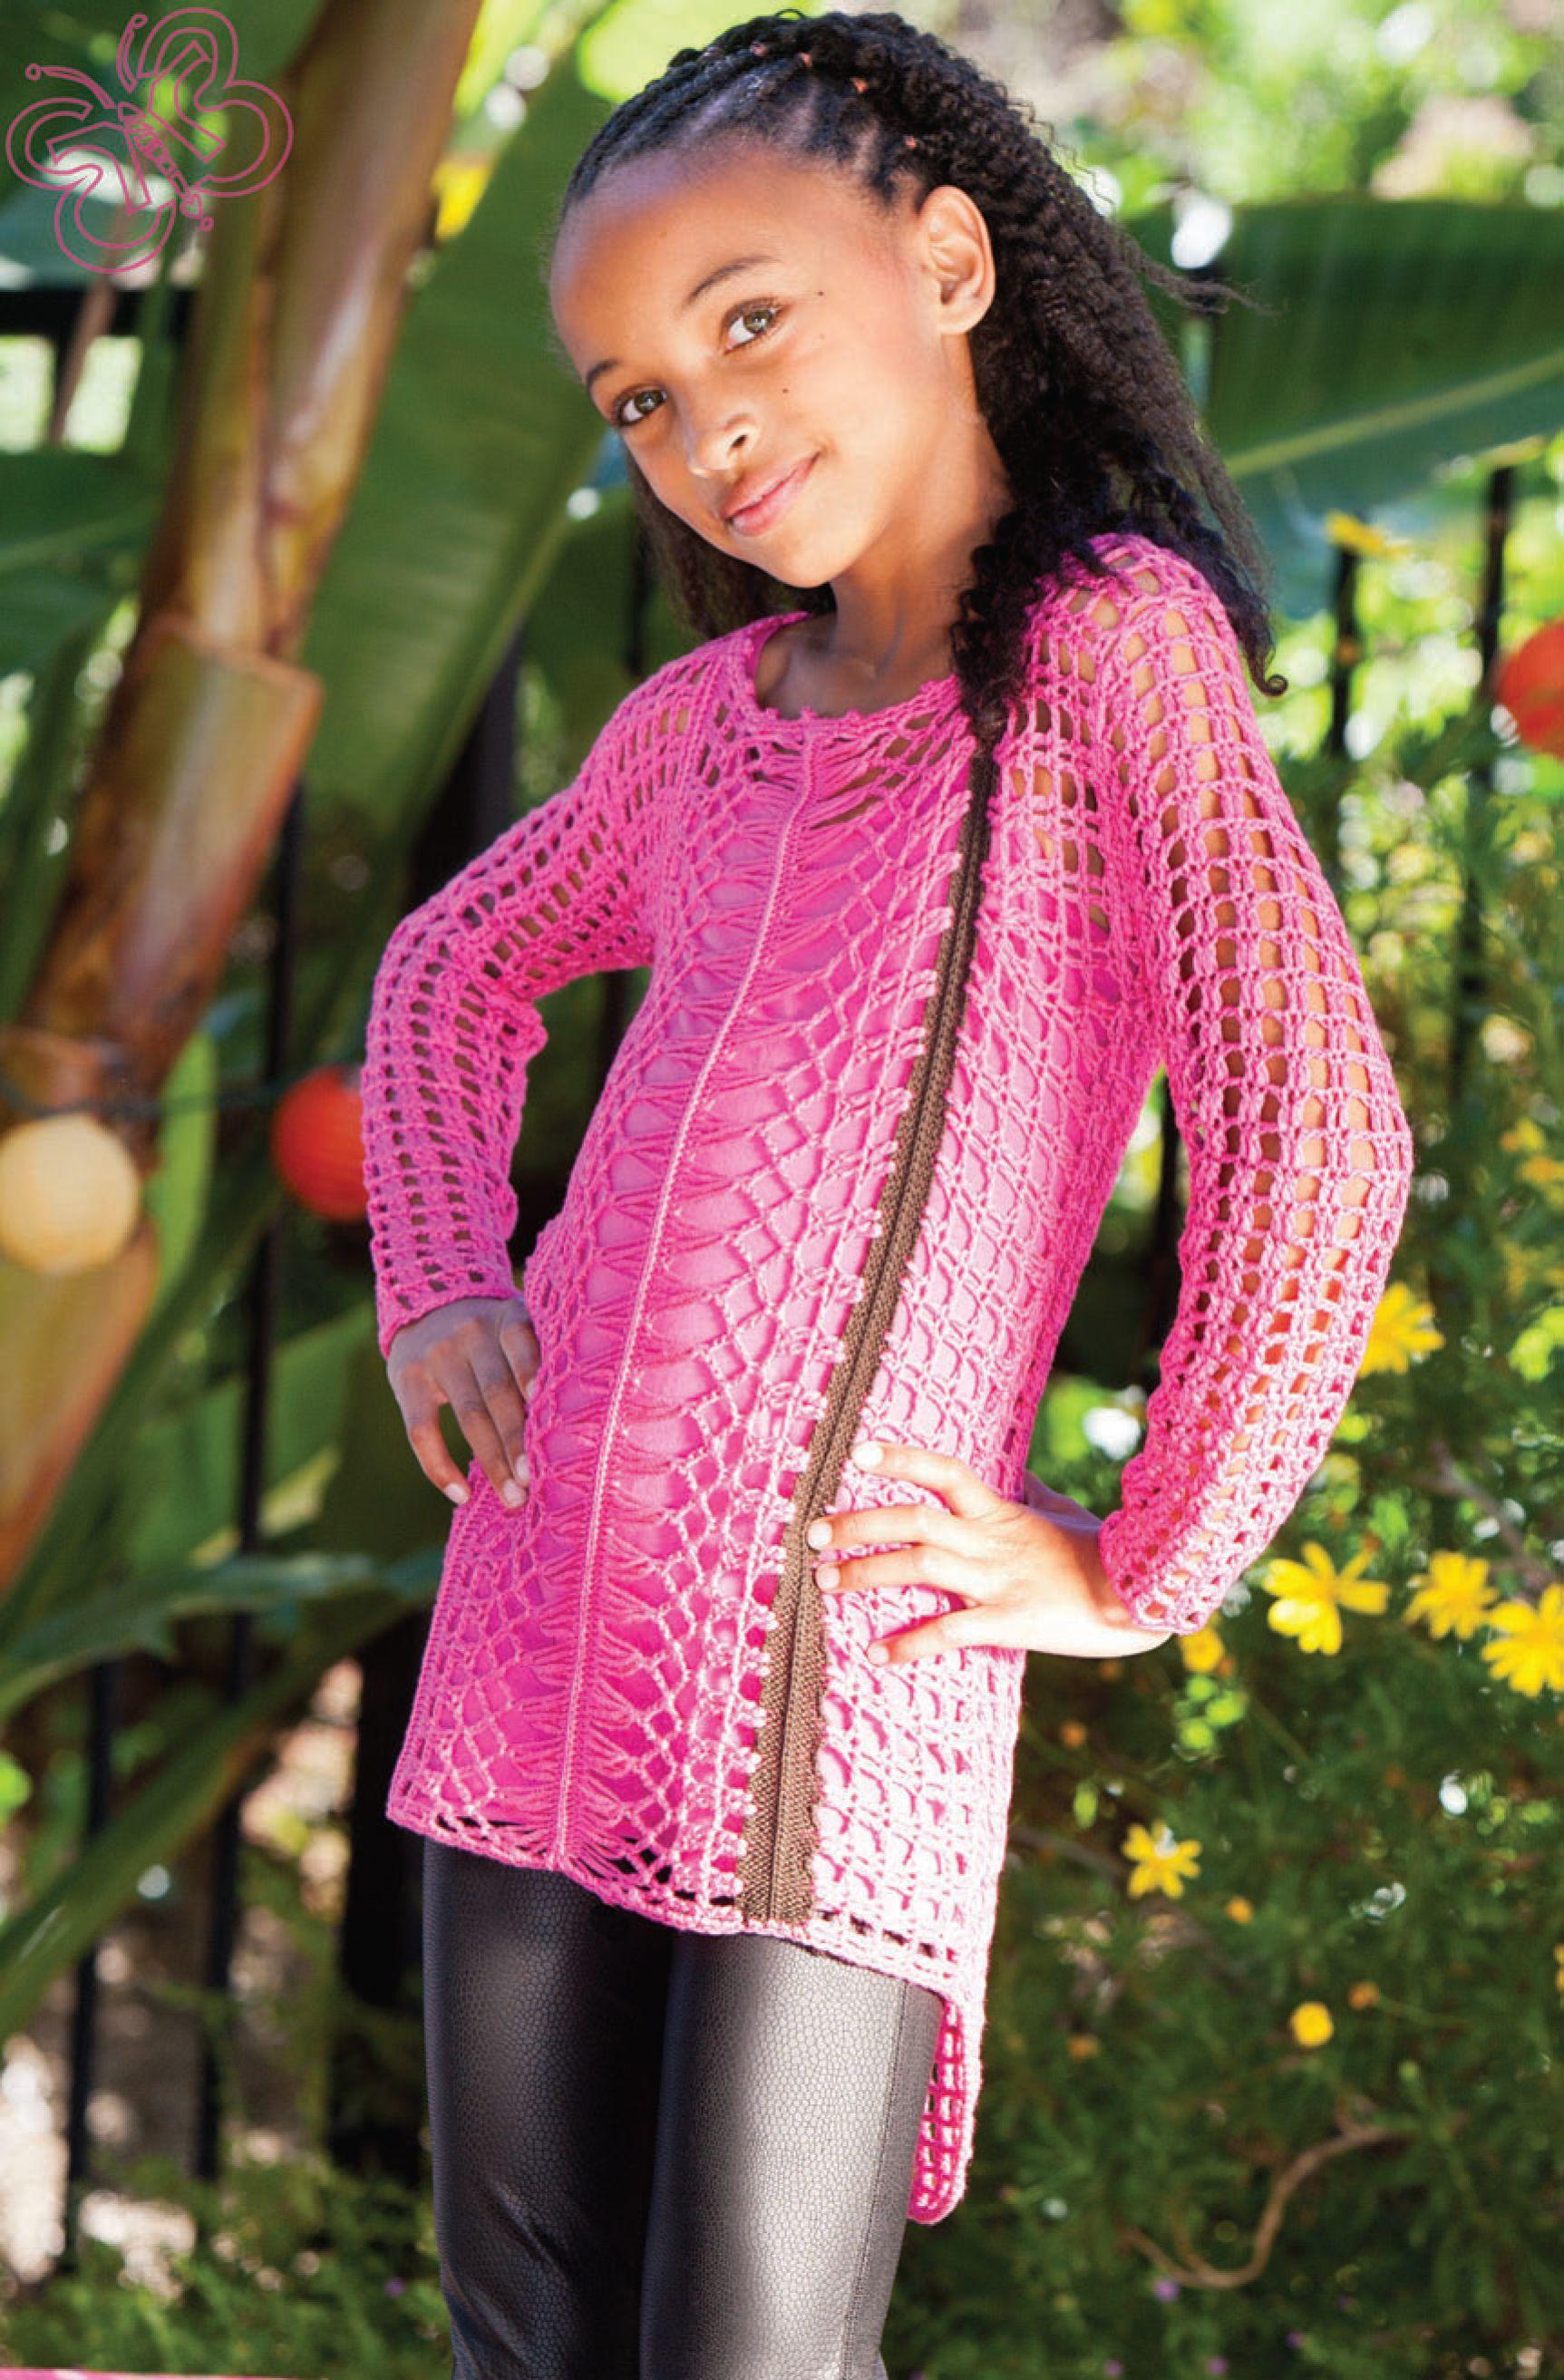 Tween Fashion | LittleFashionsBoutique.com Blog » Tween Clothing ...